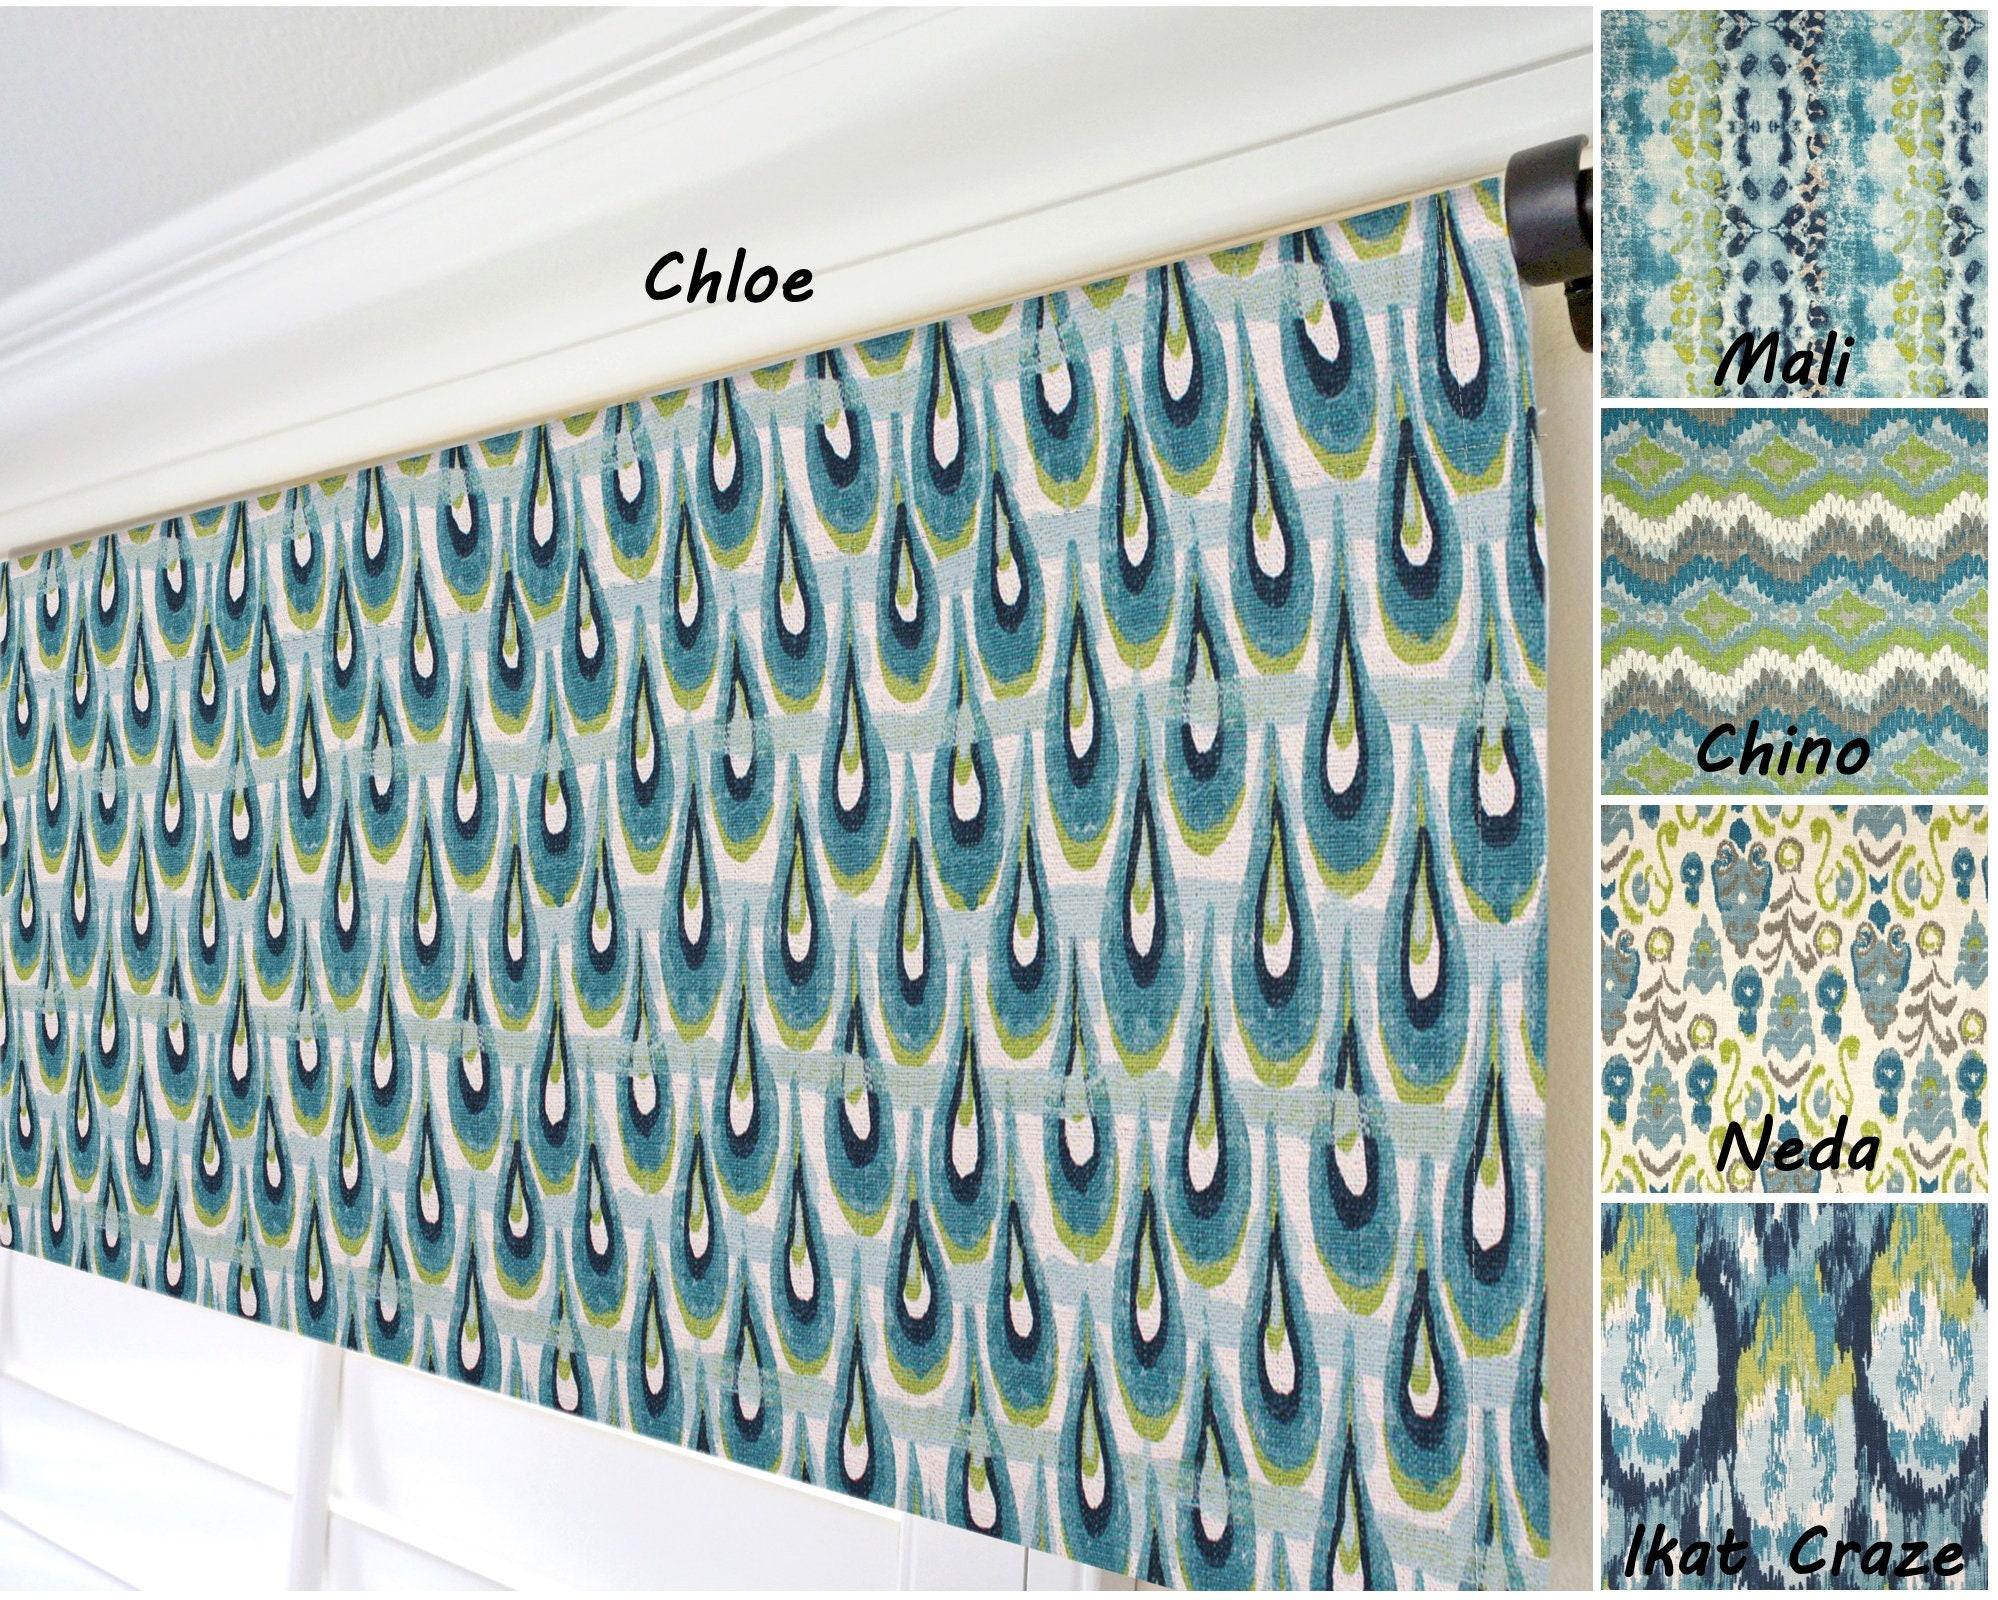 Navy Blue White Lime Green Peacock Colors Window Treatments Valance Panel 52 x 15 Geometric Ikat Chevron Damask Trellis